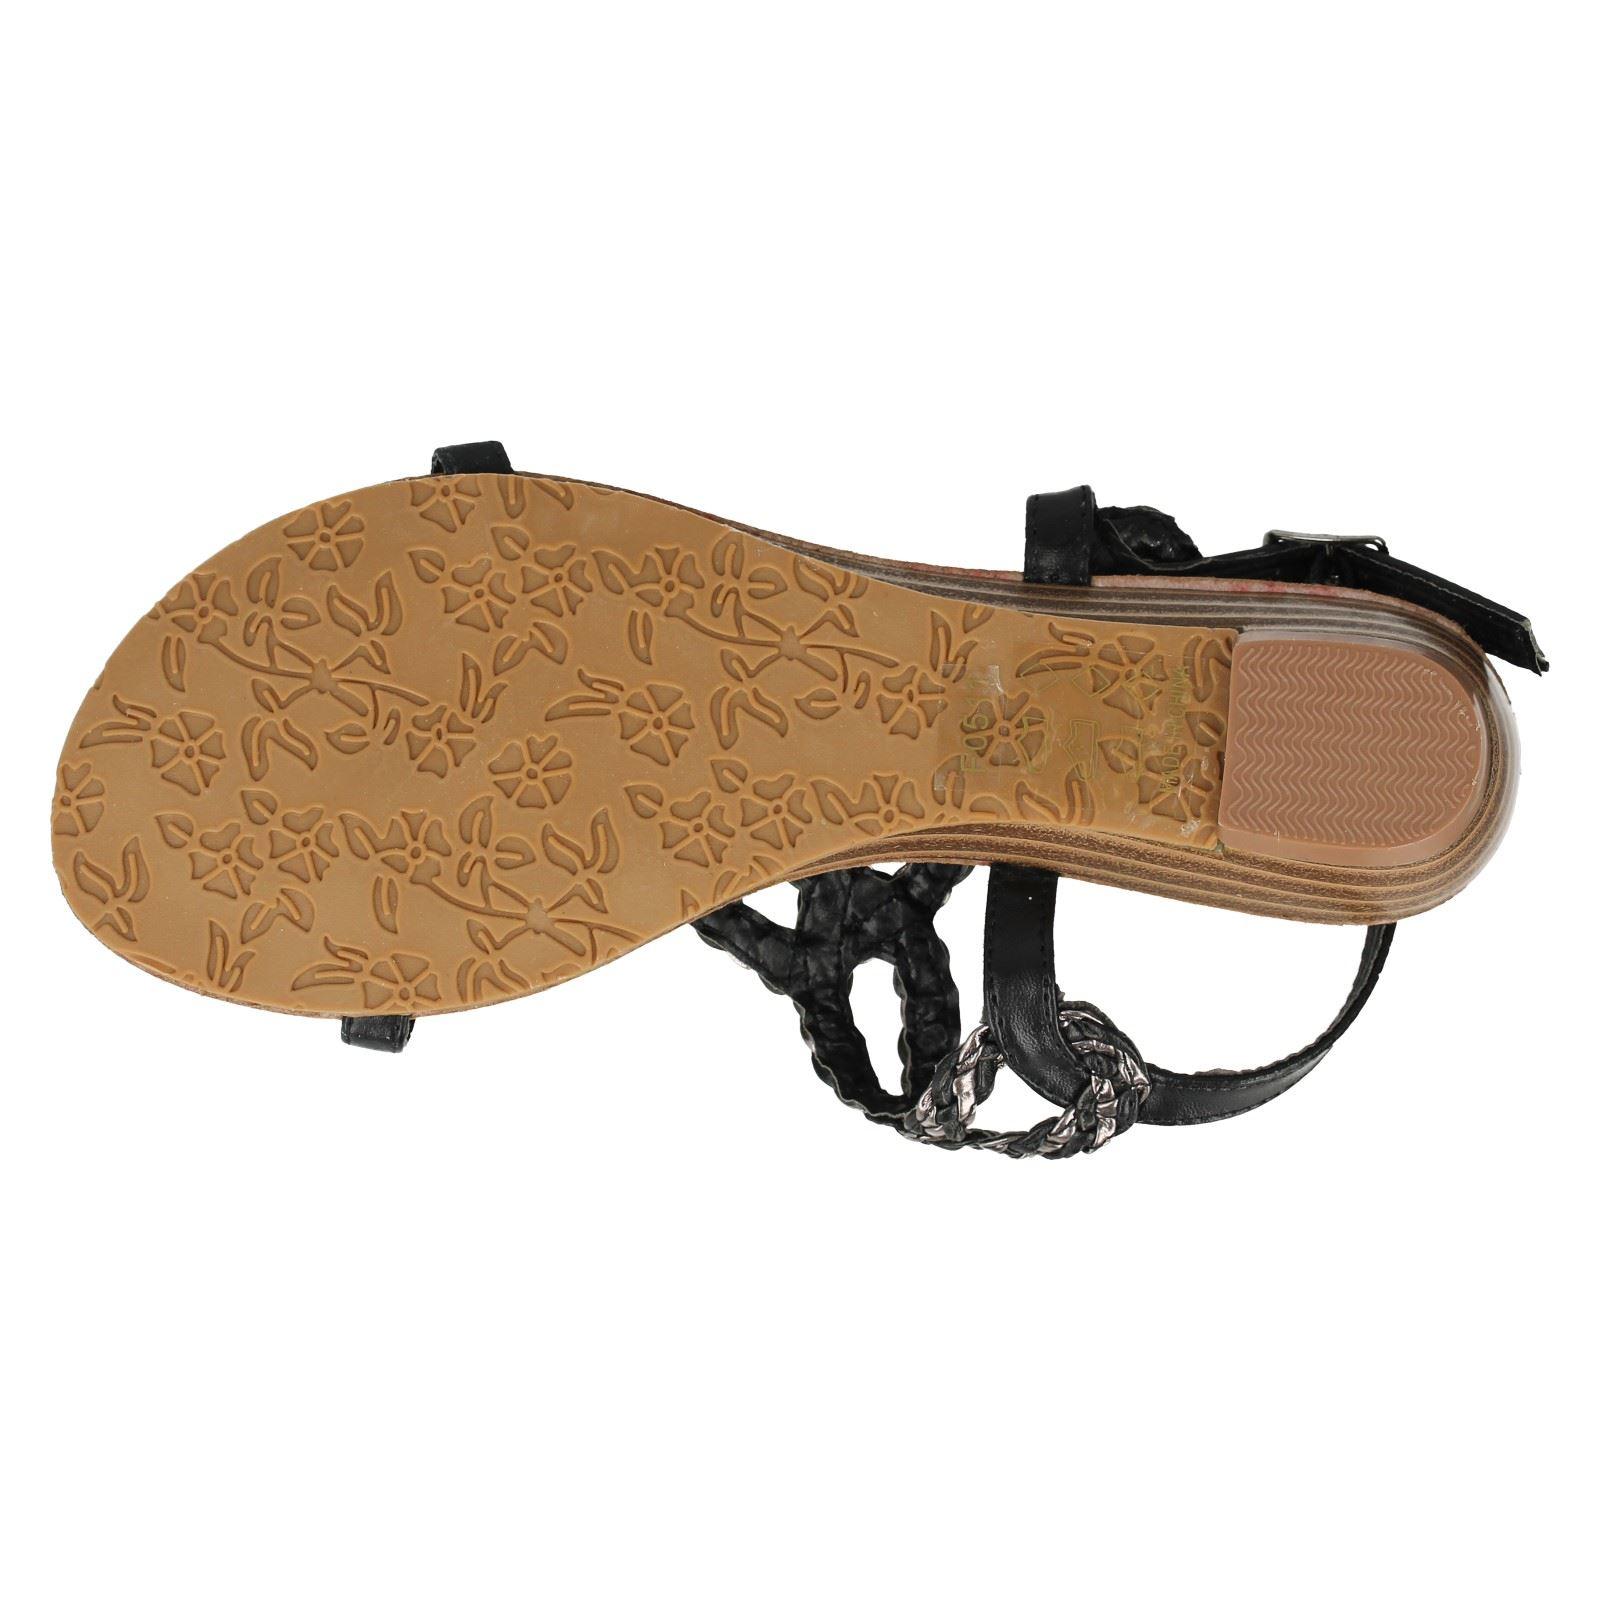 Verano señoras de punto en tejida superior Sandalias De Estilo-F0511